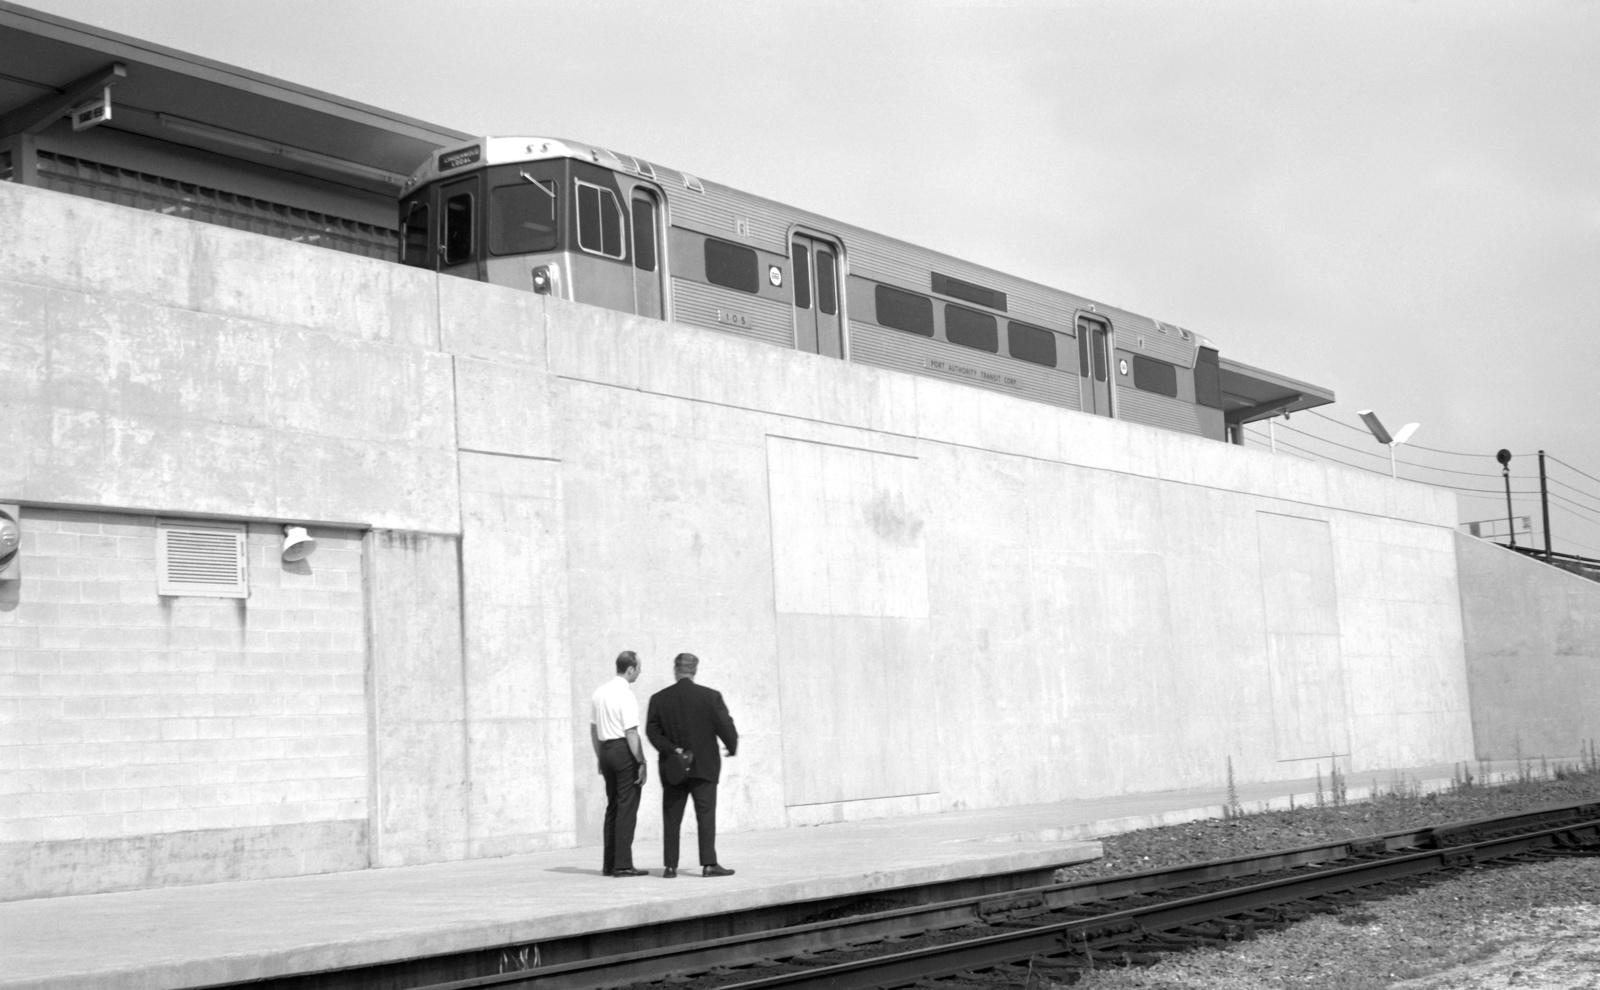 (399k, 1600x990)<br><b>Country:</b> United States<br><b>City:</b> Philadelphia, PA<br><b>System:</b> PATCO<br><b>Location:</b> Lindenwold<br><b>Car:</b> PATCO 105 <br><b>Photo by:</b> Walter Broschart<br><b>Collection of:</b> David Pirmann<br><b>Date:</b> 1970<br><b>Viewed (this week/total):</b> 1 / 92